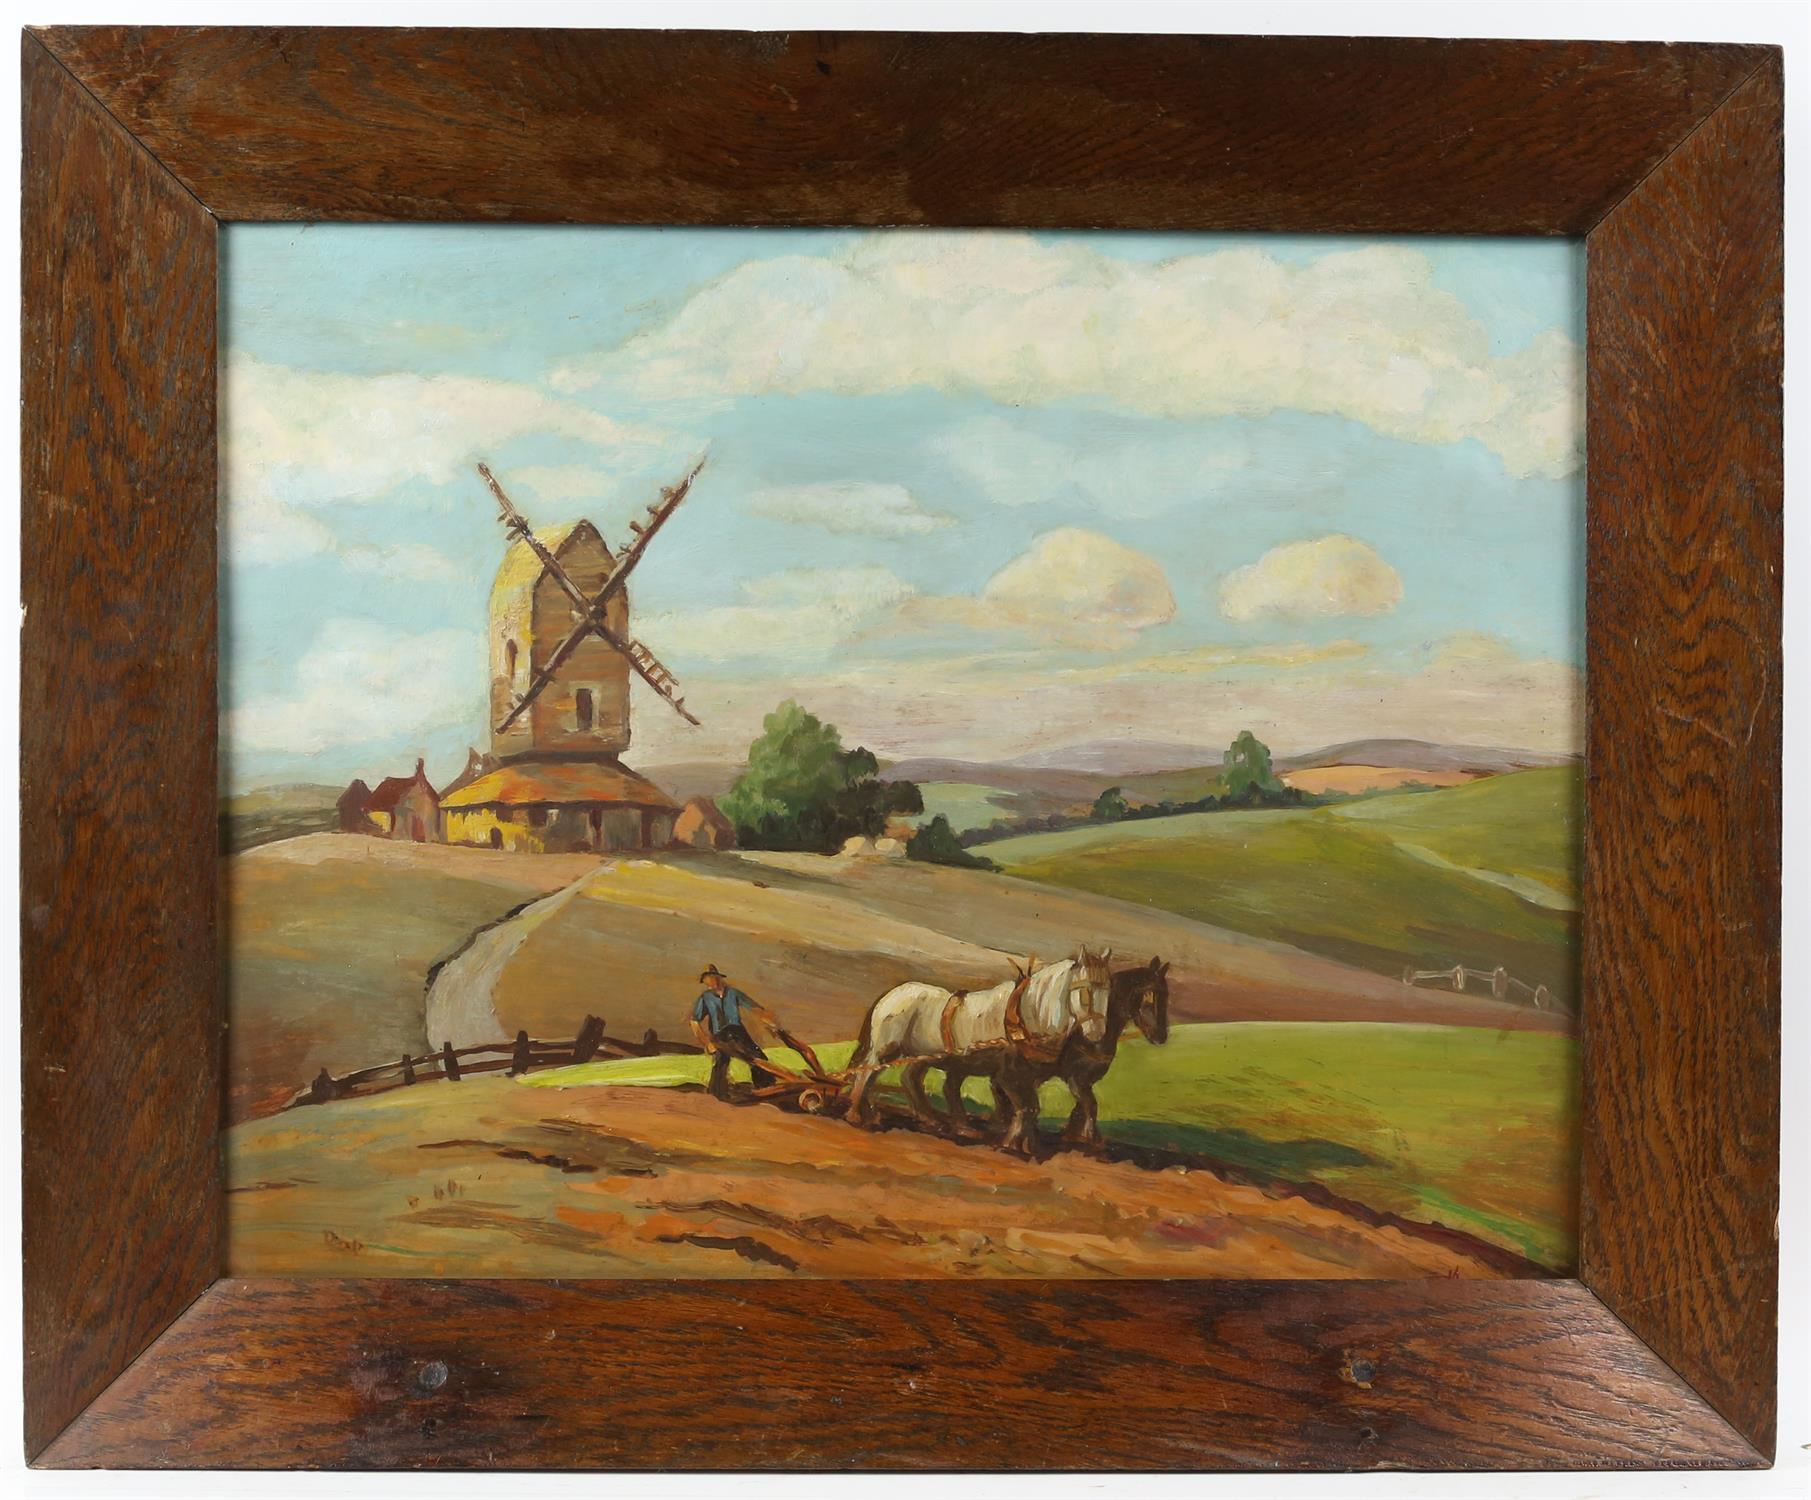 'JM'. (British School 19/20th Century). Plough team near a windmill. Oil on board, - Image 2 of 4